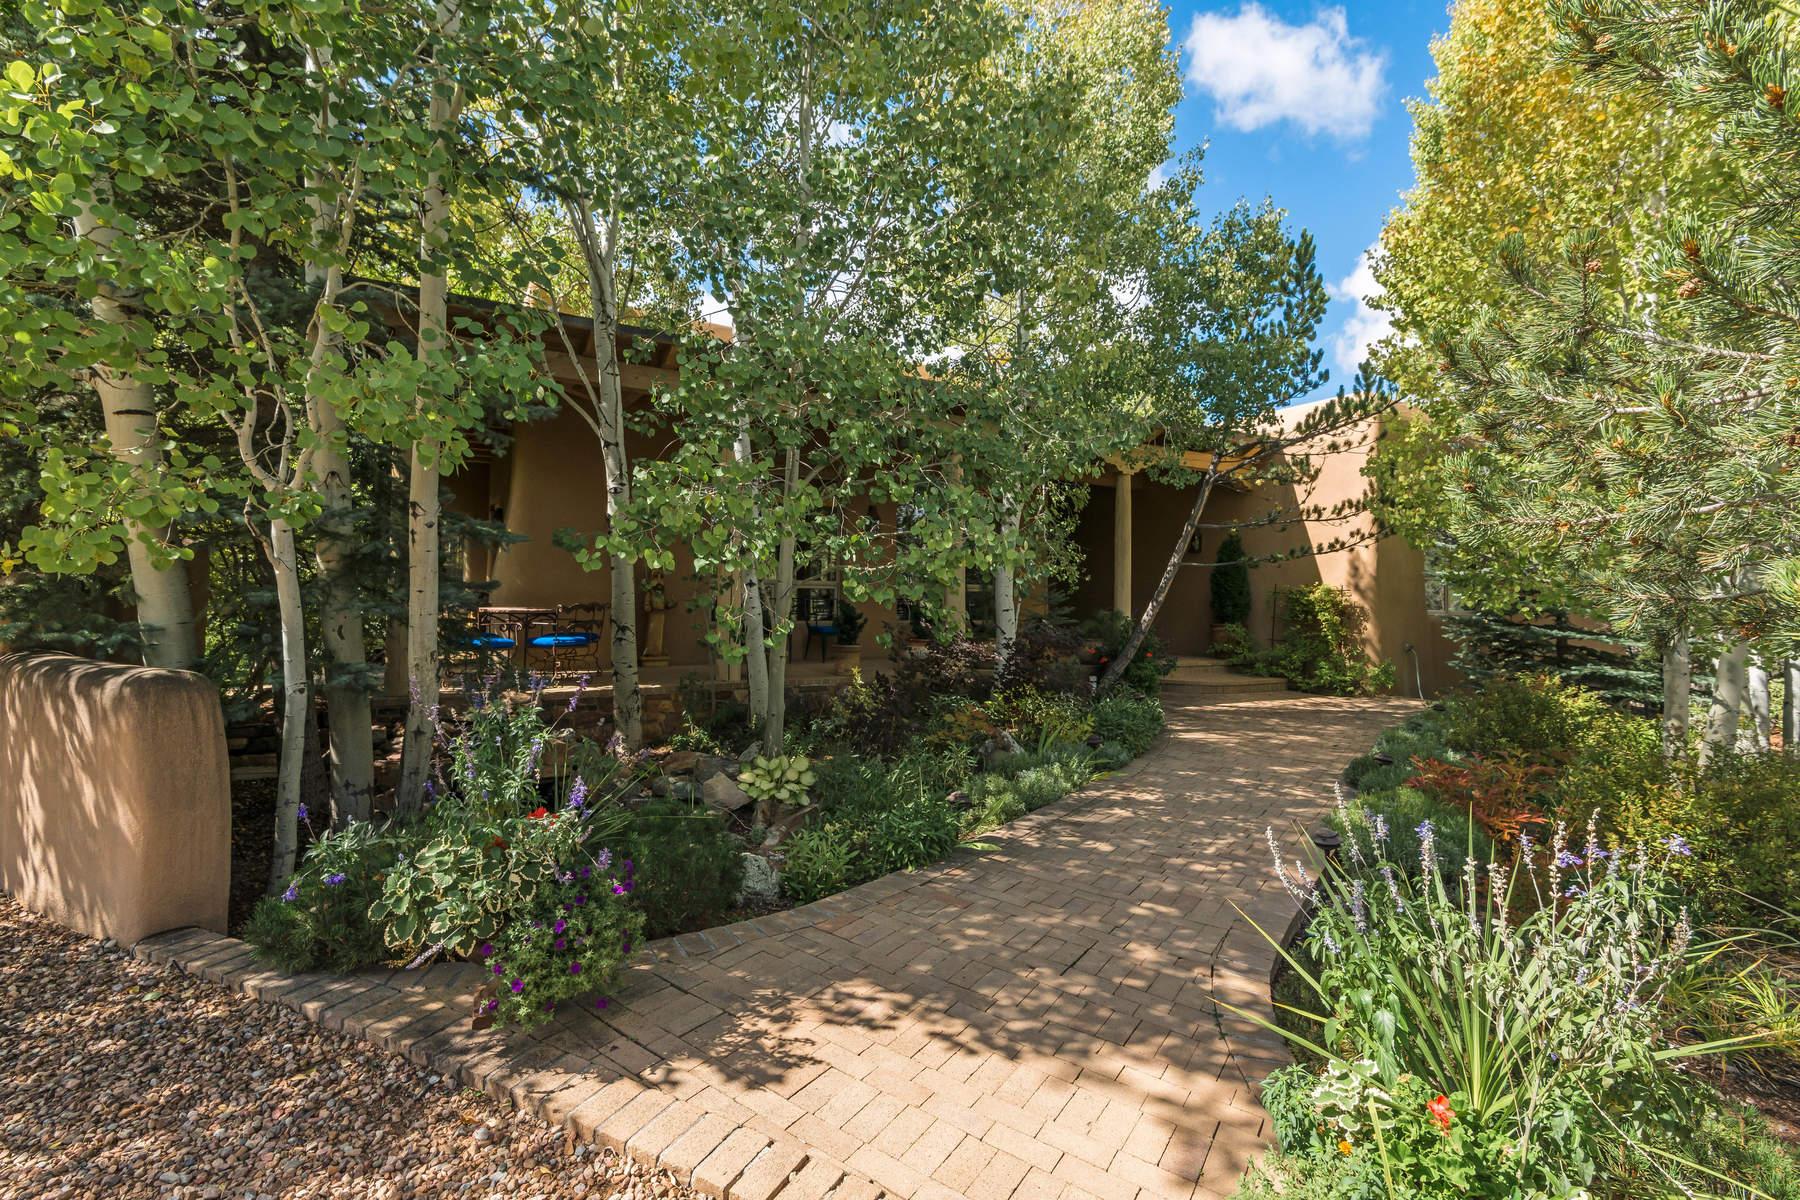 Single Family Home for Sale at 720 Camino Cabra Santa Fe City Southeast, Santa Fe, New Mexico, 87505 United States